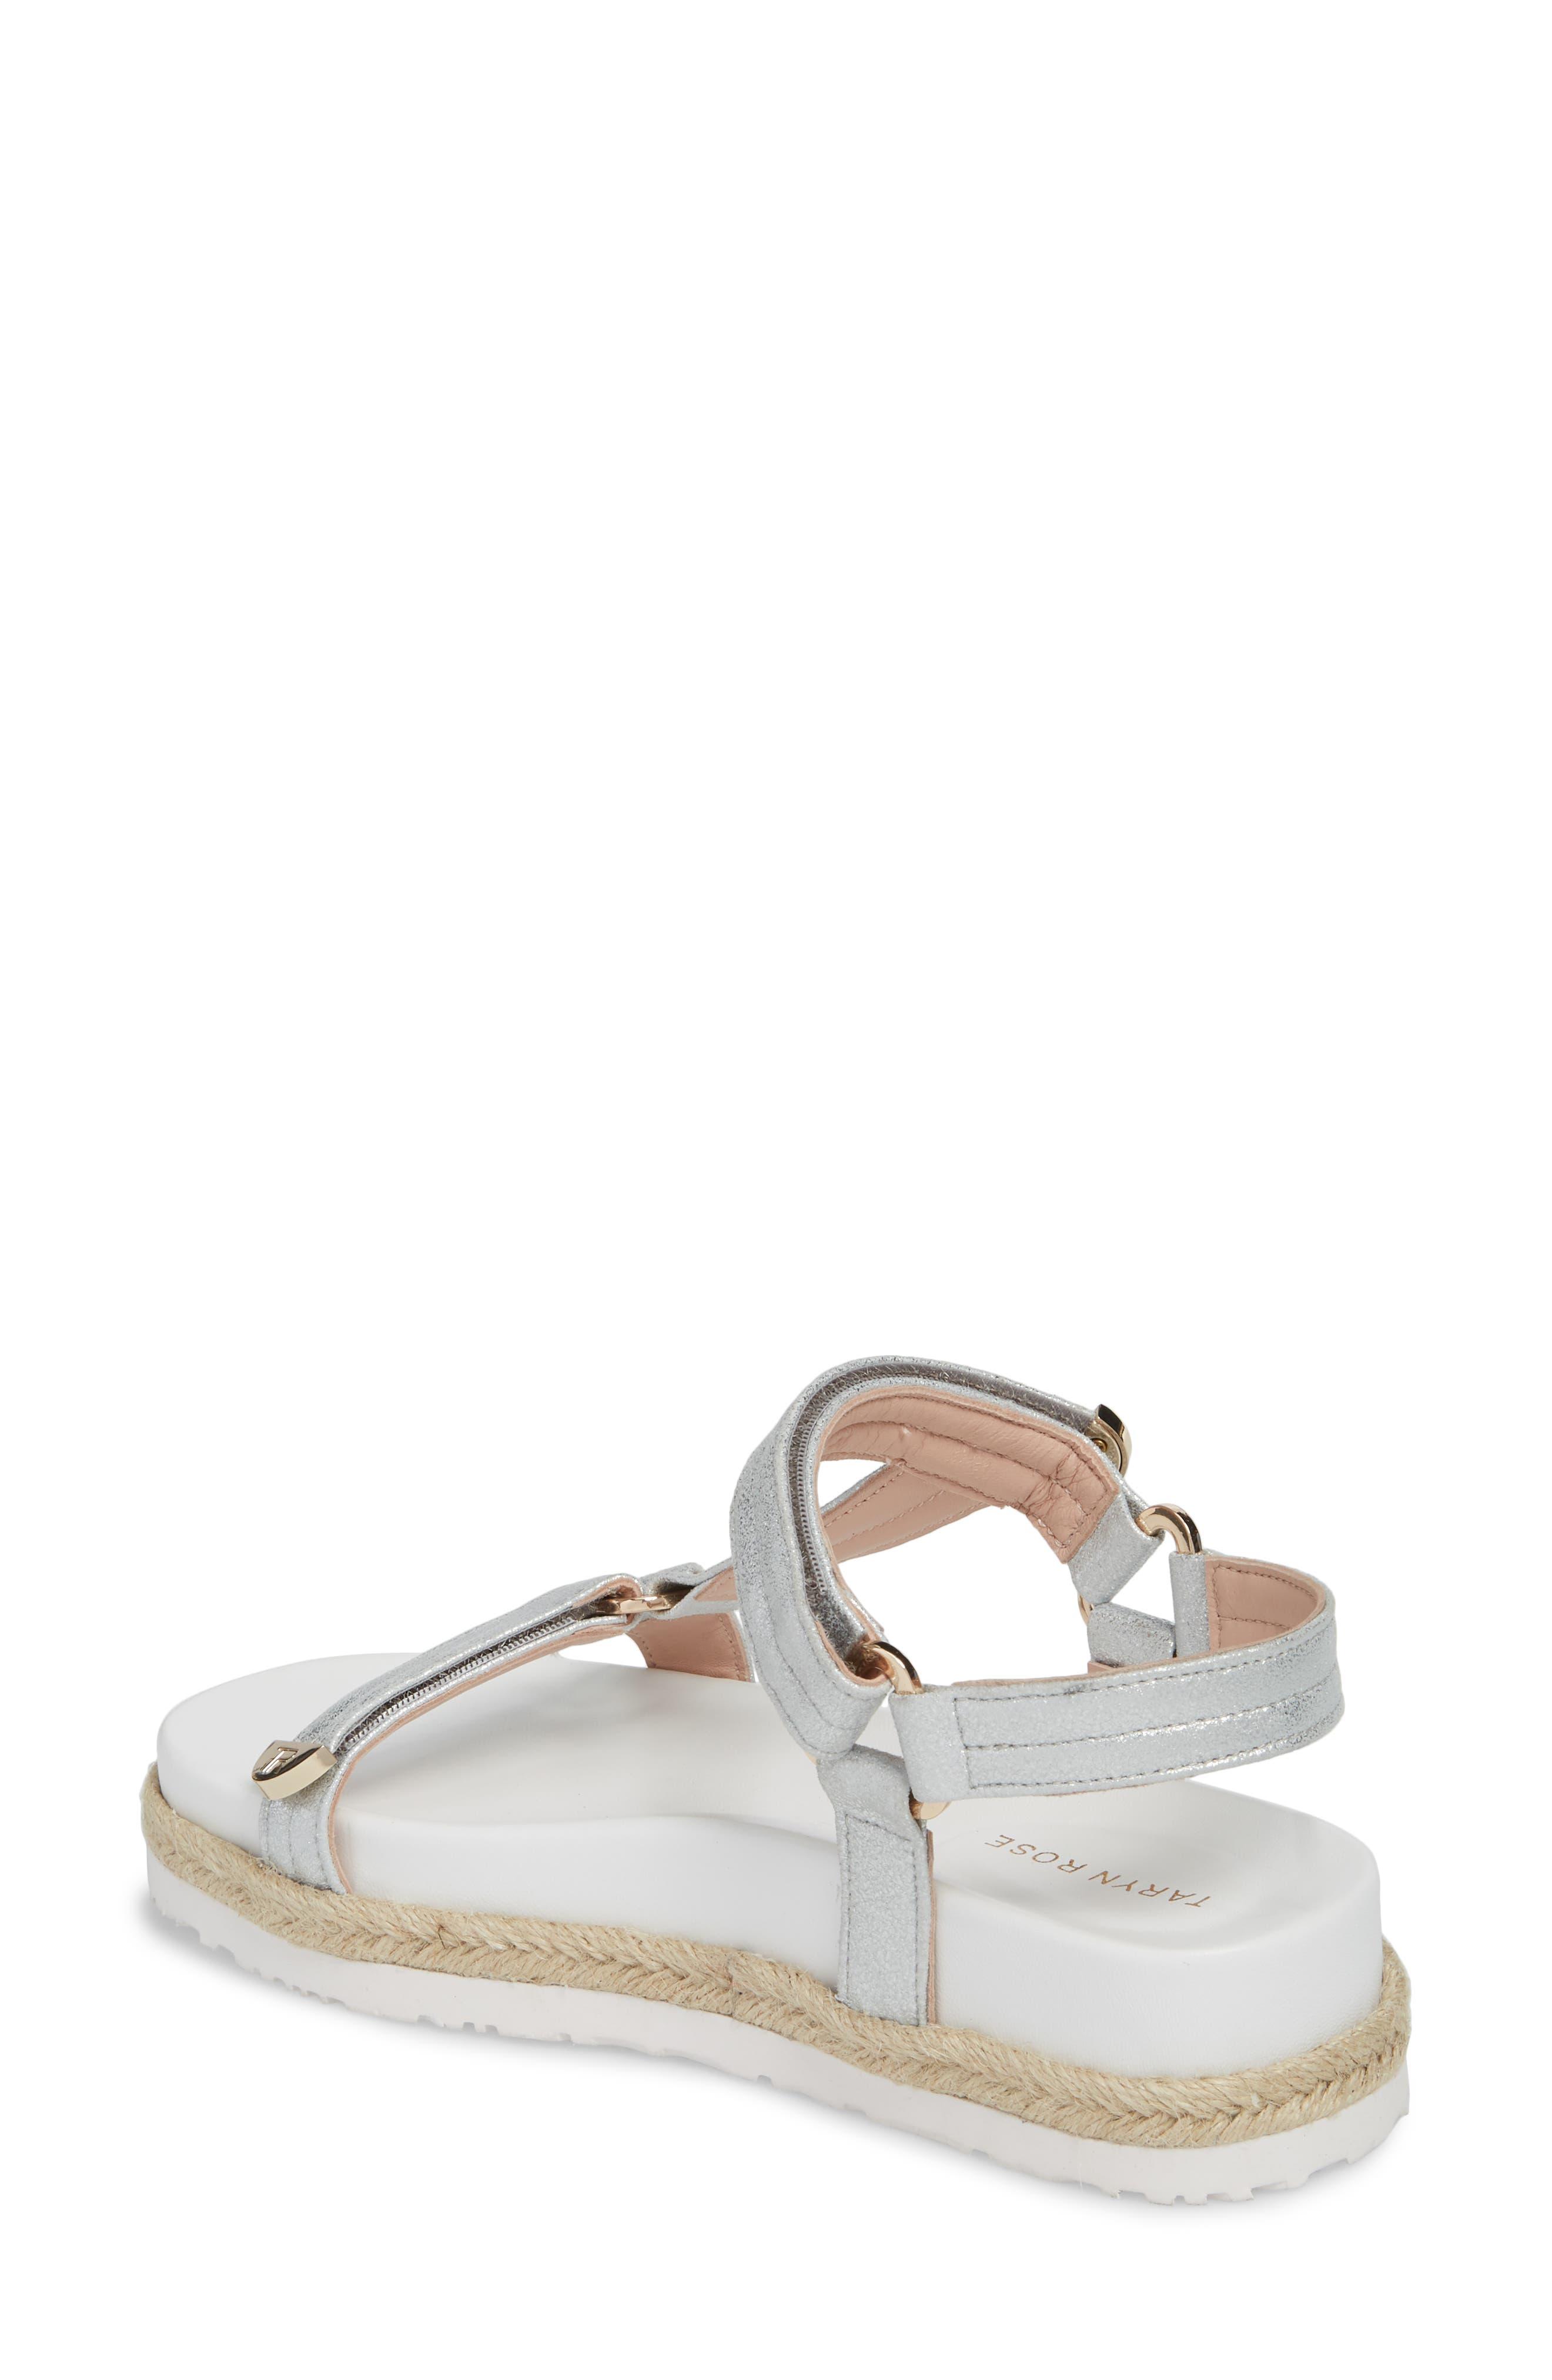 Lydia Platform Sport Sandal,                             Alternate thumbnail 2, color,                             Silver Leather